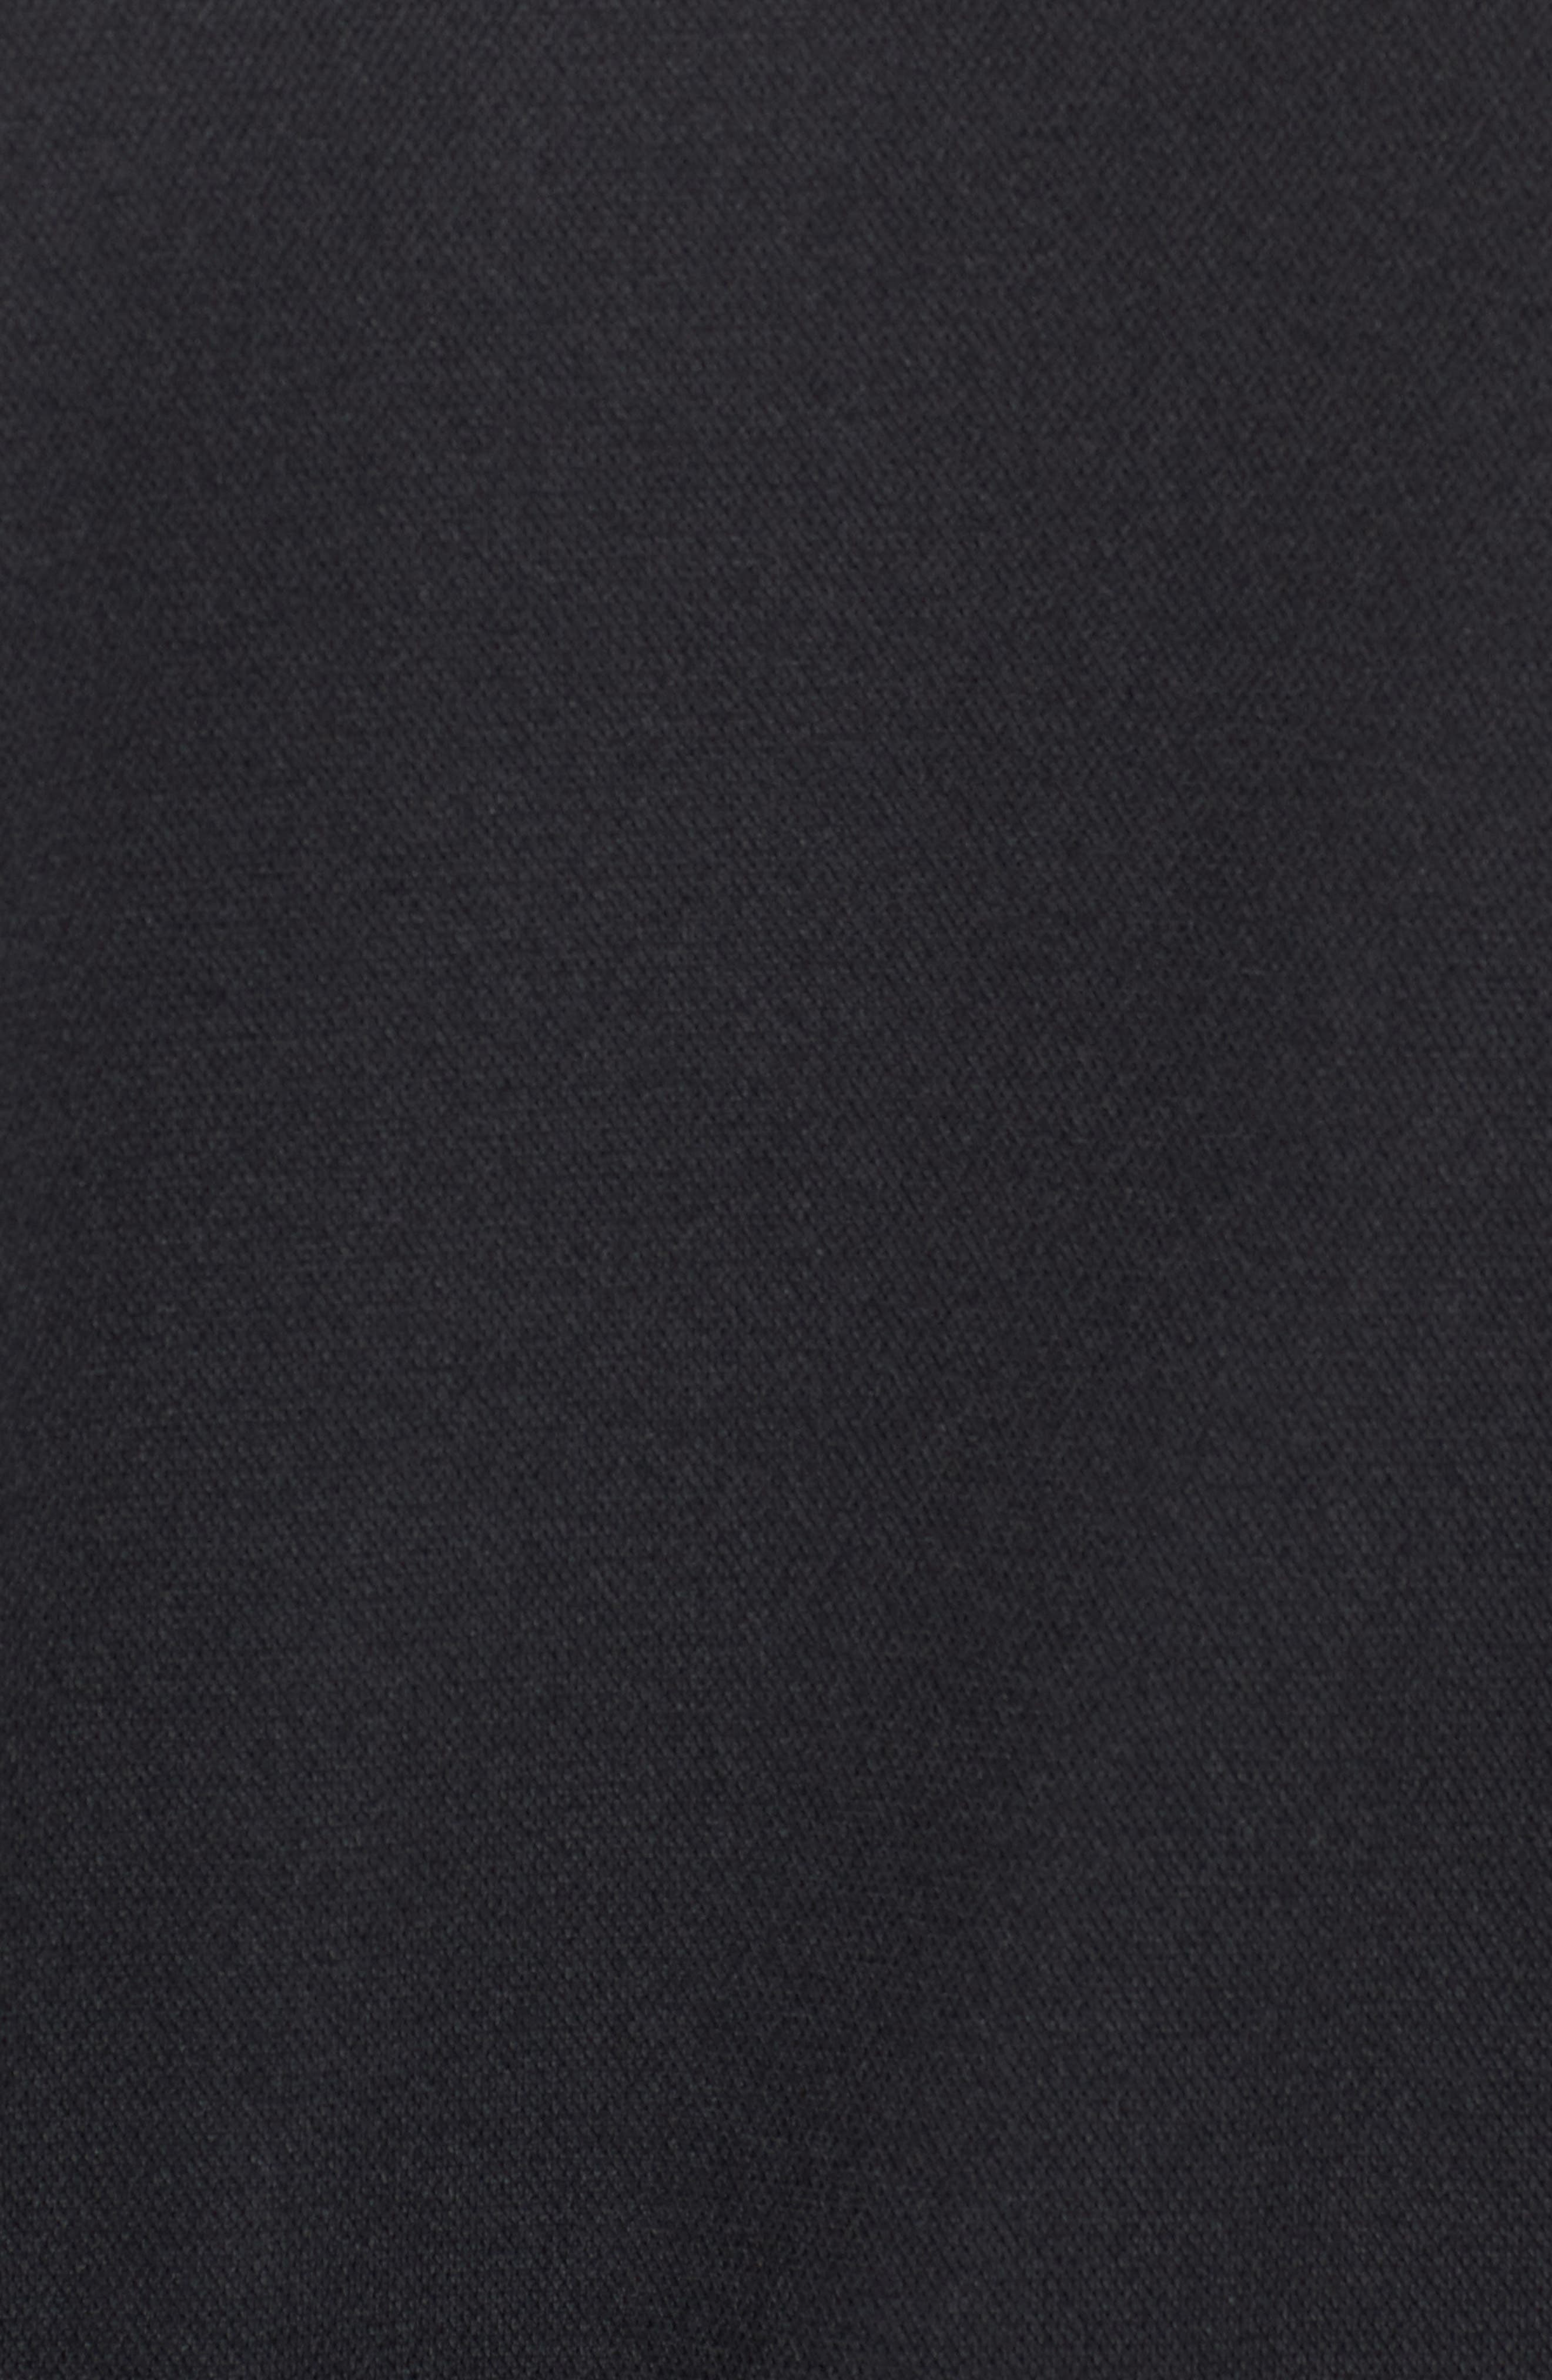 Ultimate Flight Zip Jacket,                             Alternate thumbnail 6, color,                             Black/ Black